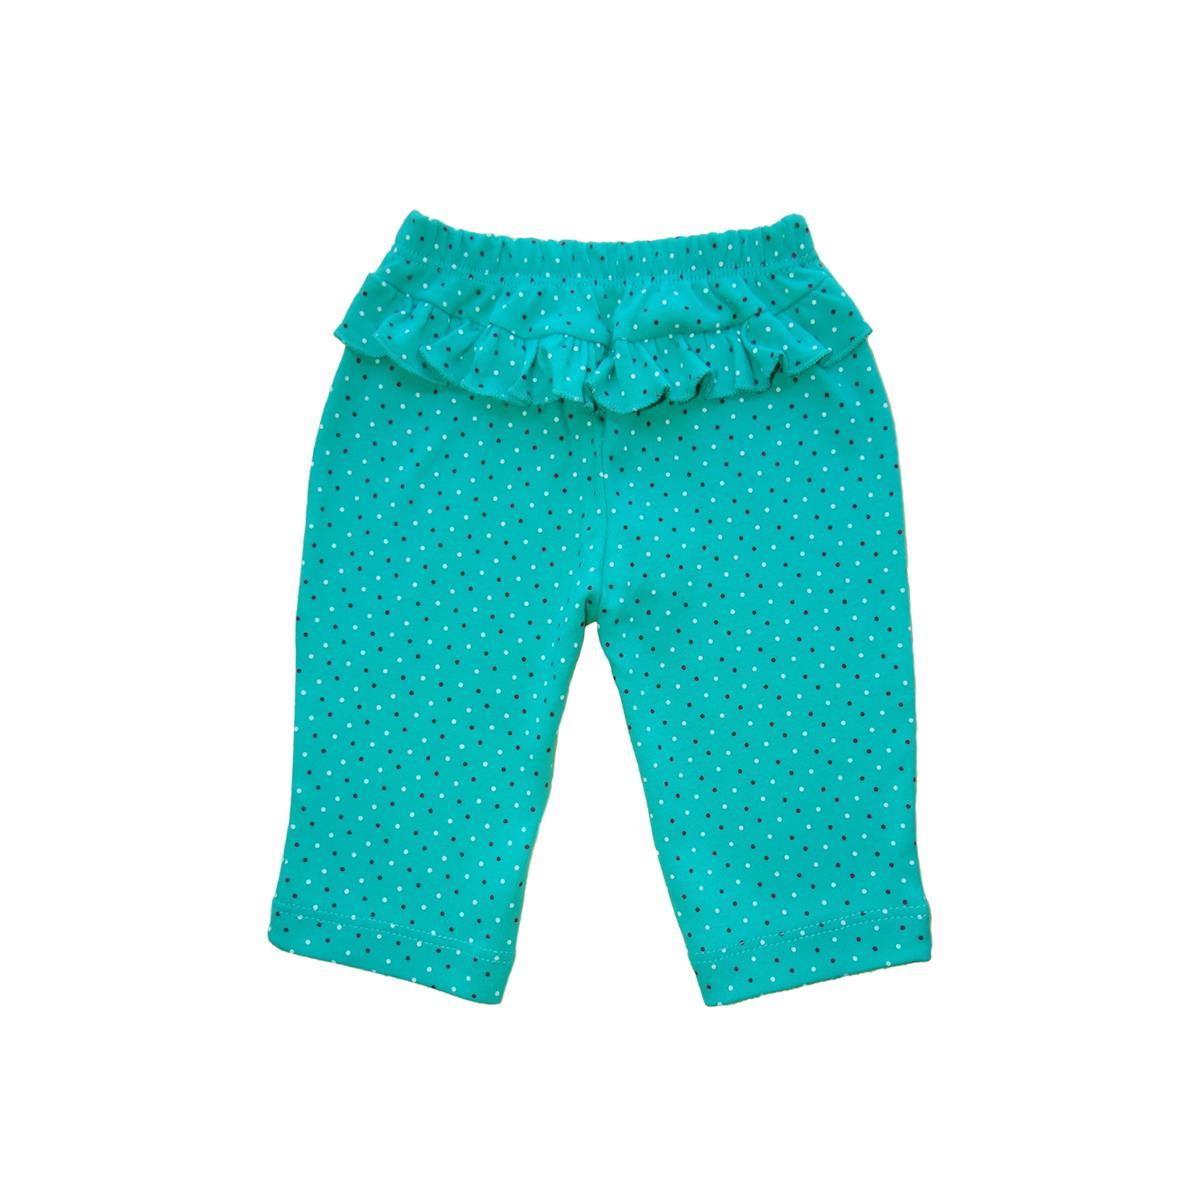 Calça Feminina Bolinhas Primavera  - Piu Blu